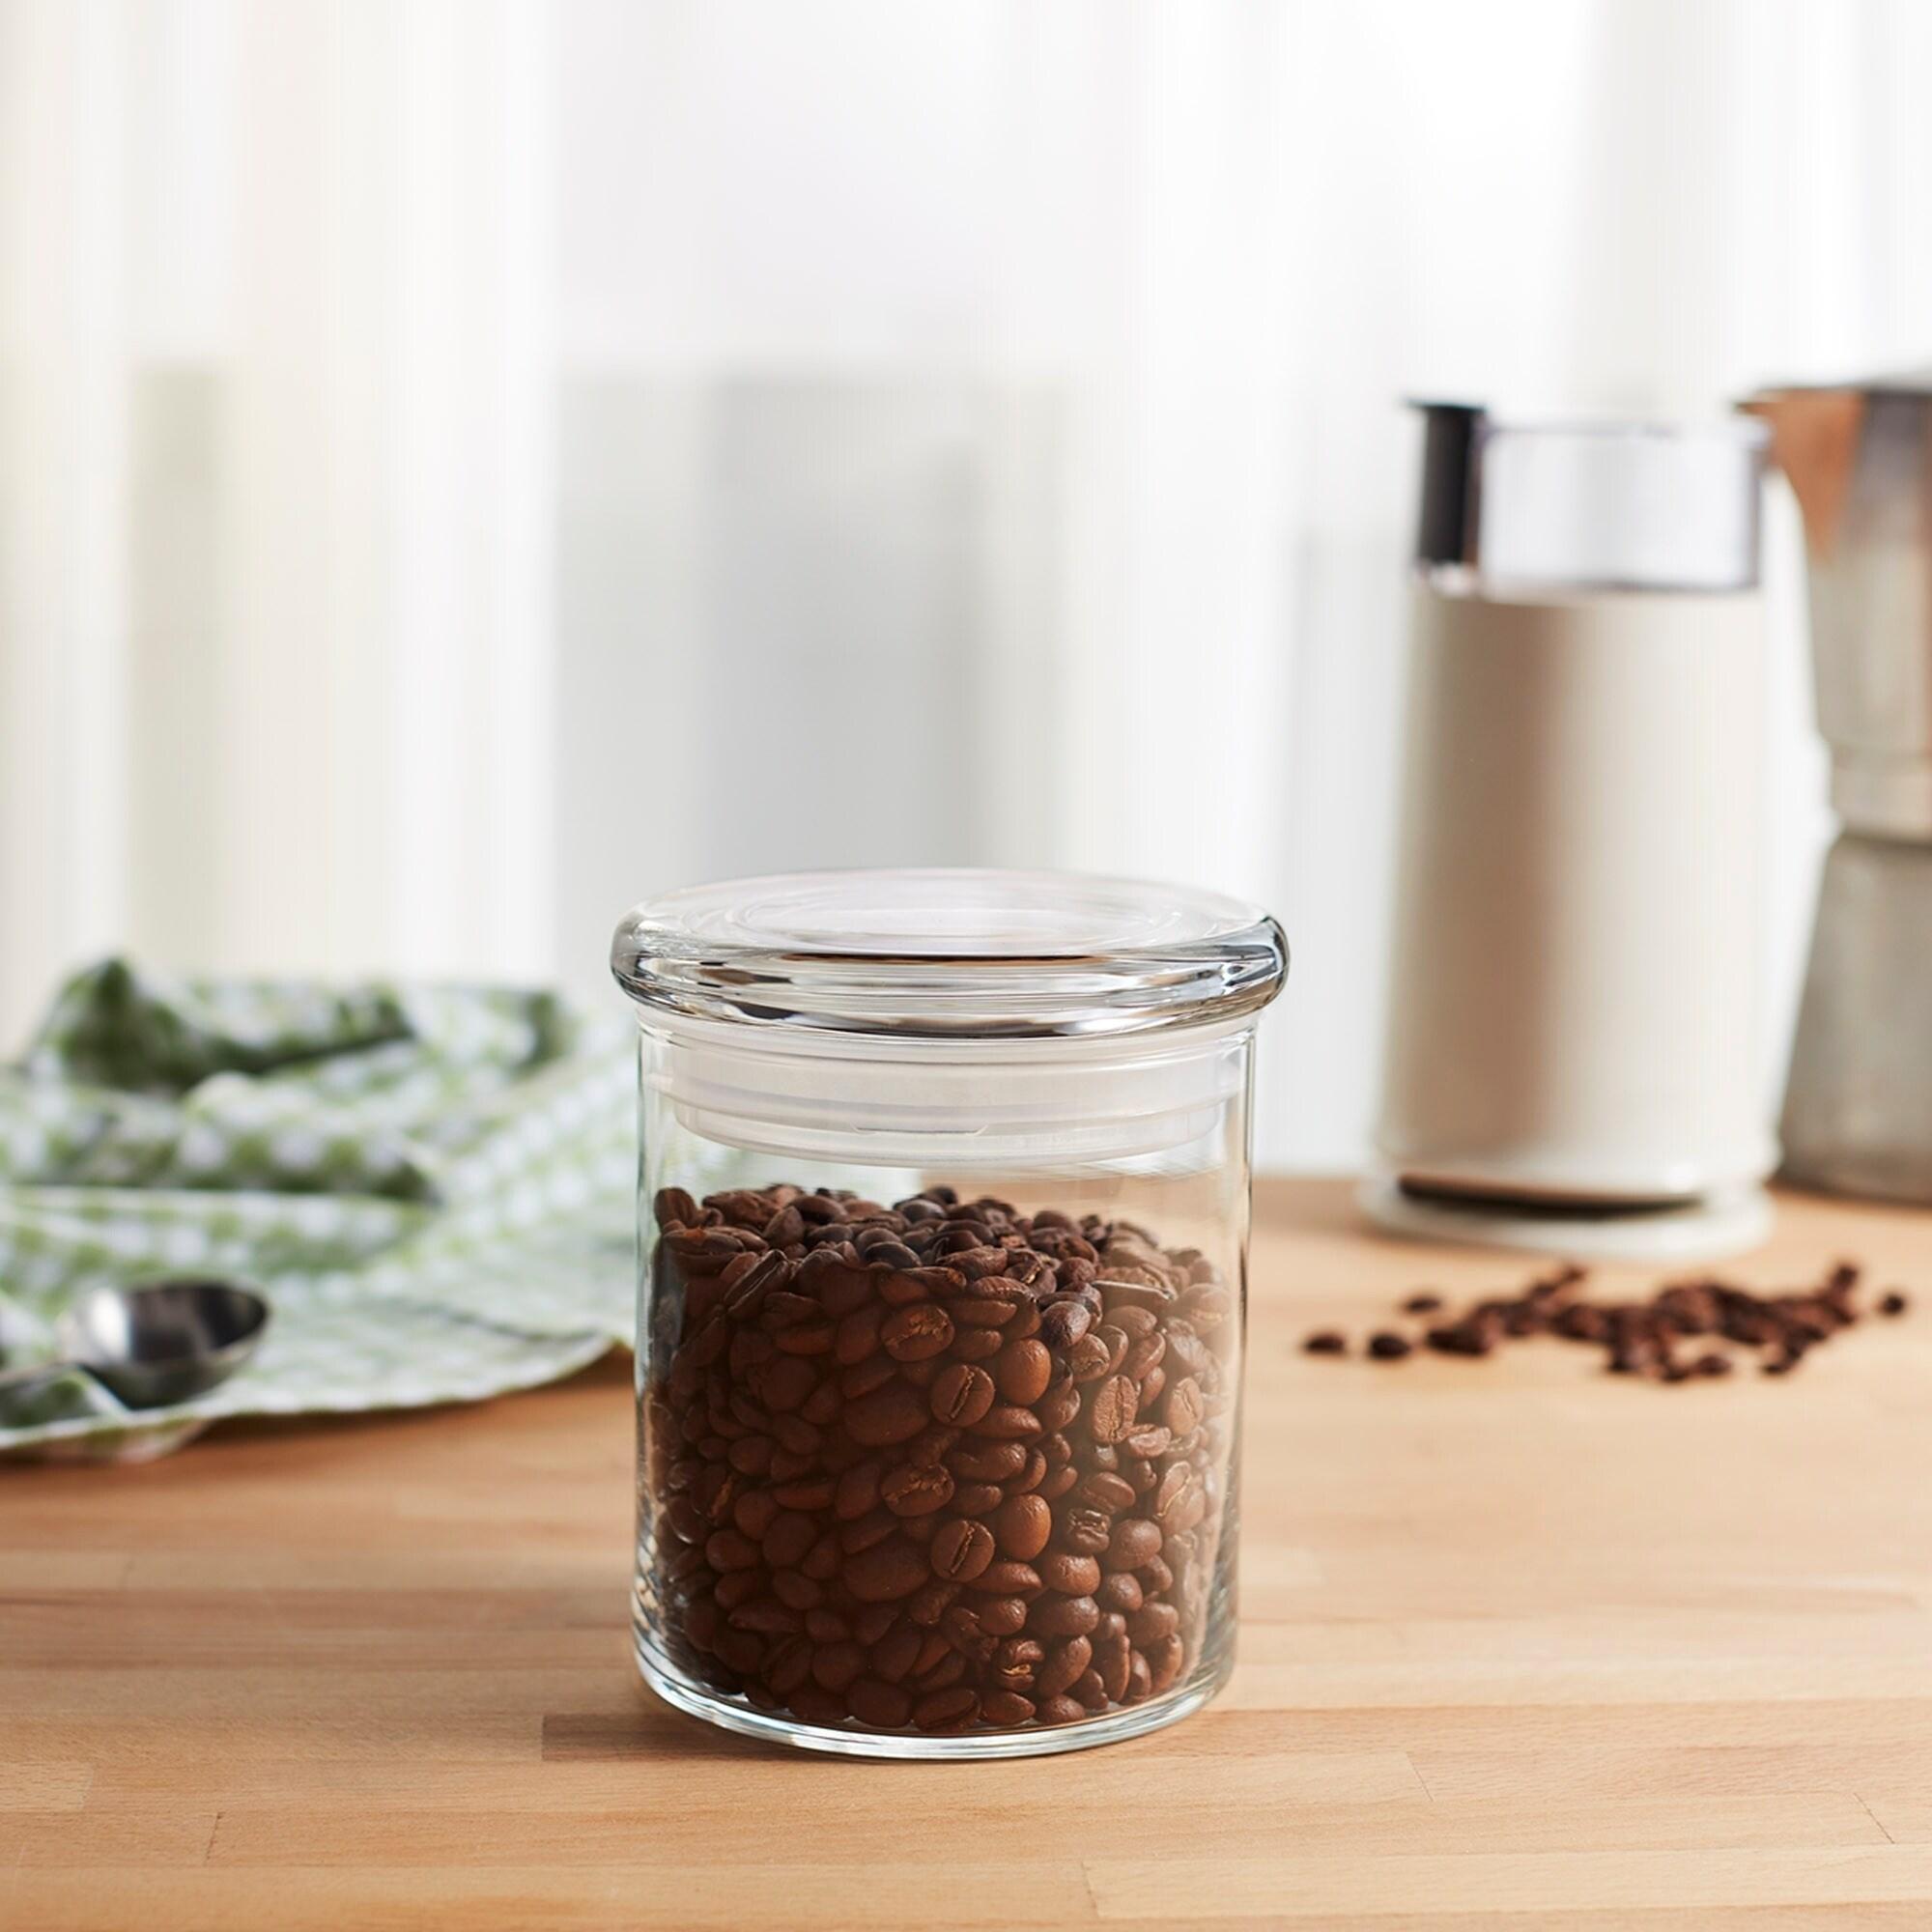 Libbey Cylinder 3-piece Glass Jar Set with Lids